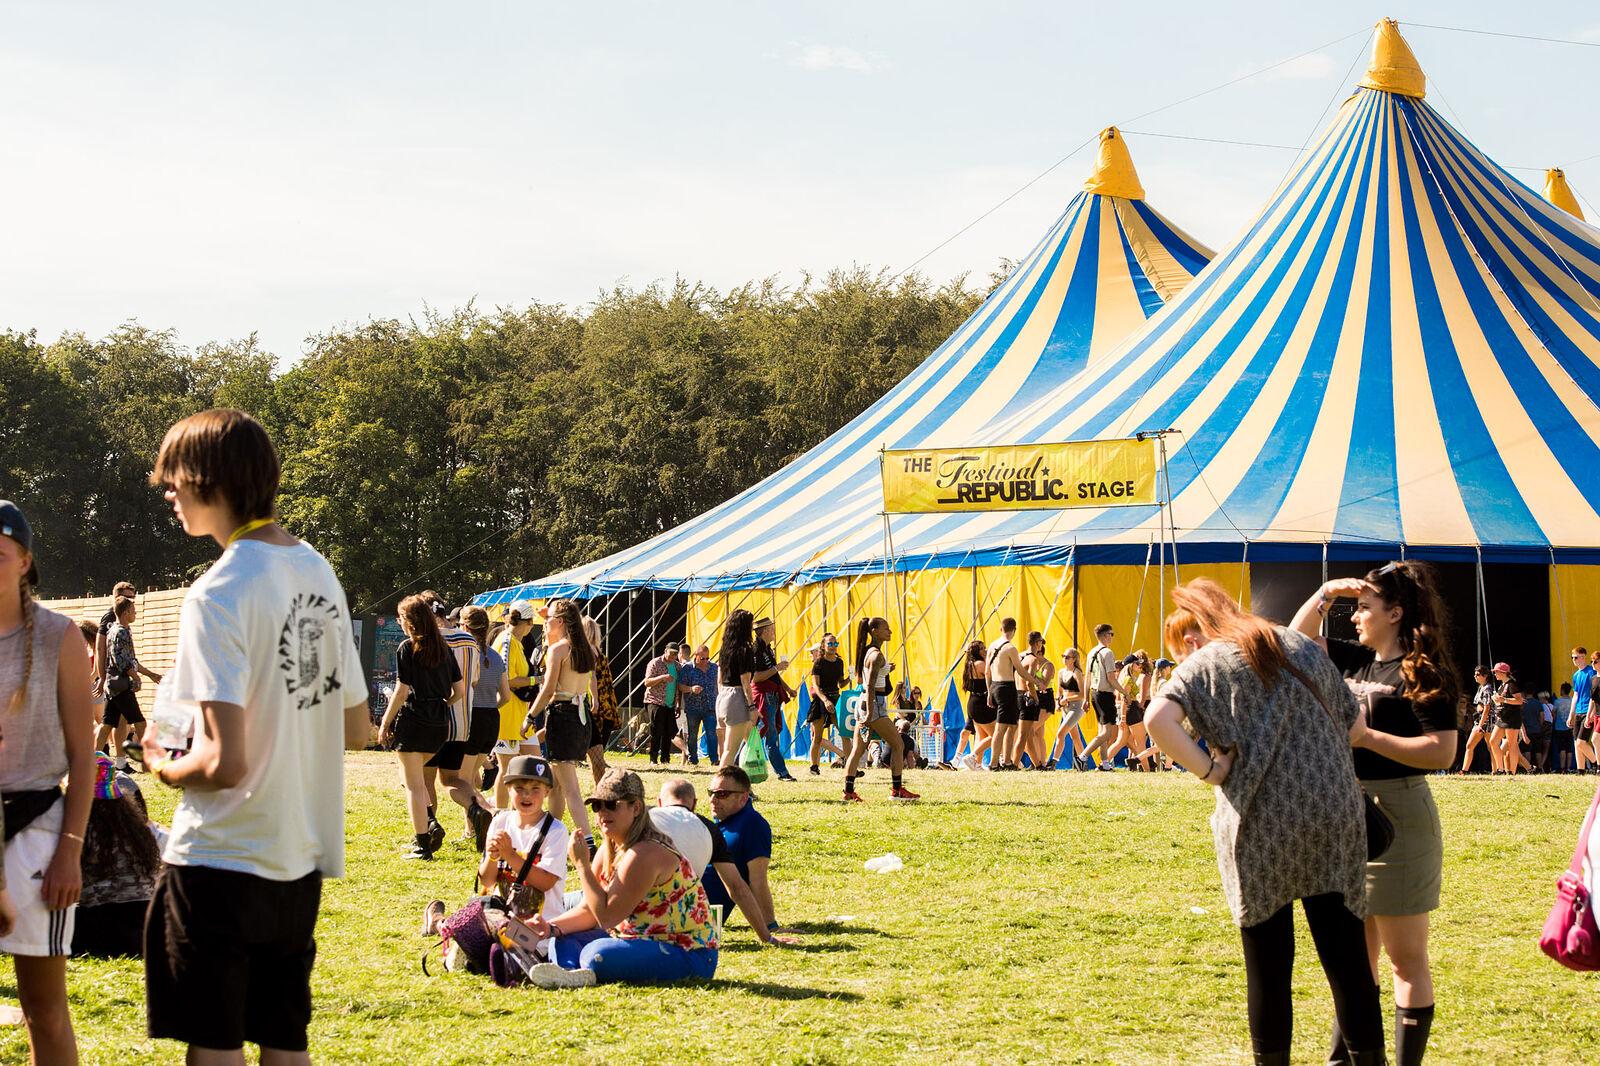 Leeds Festival 2019